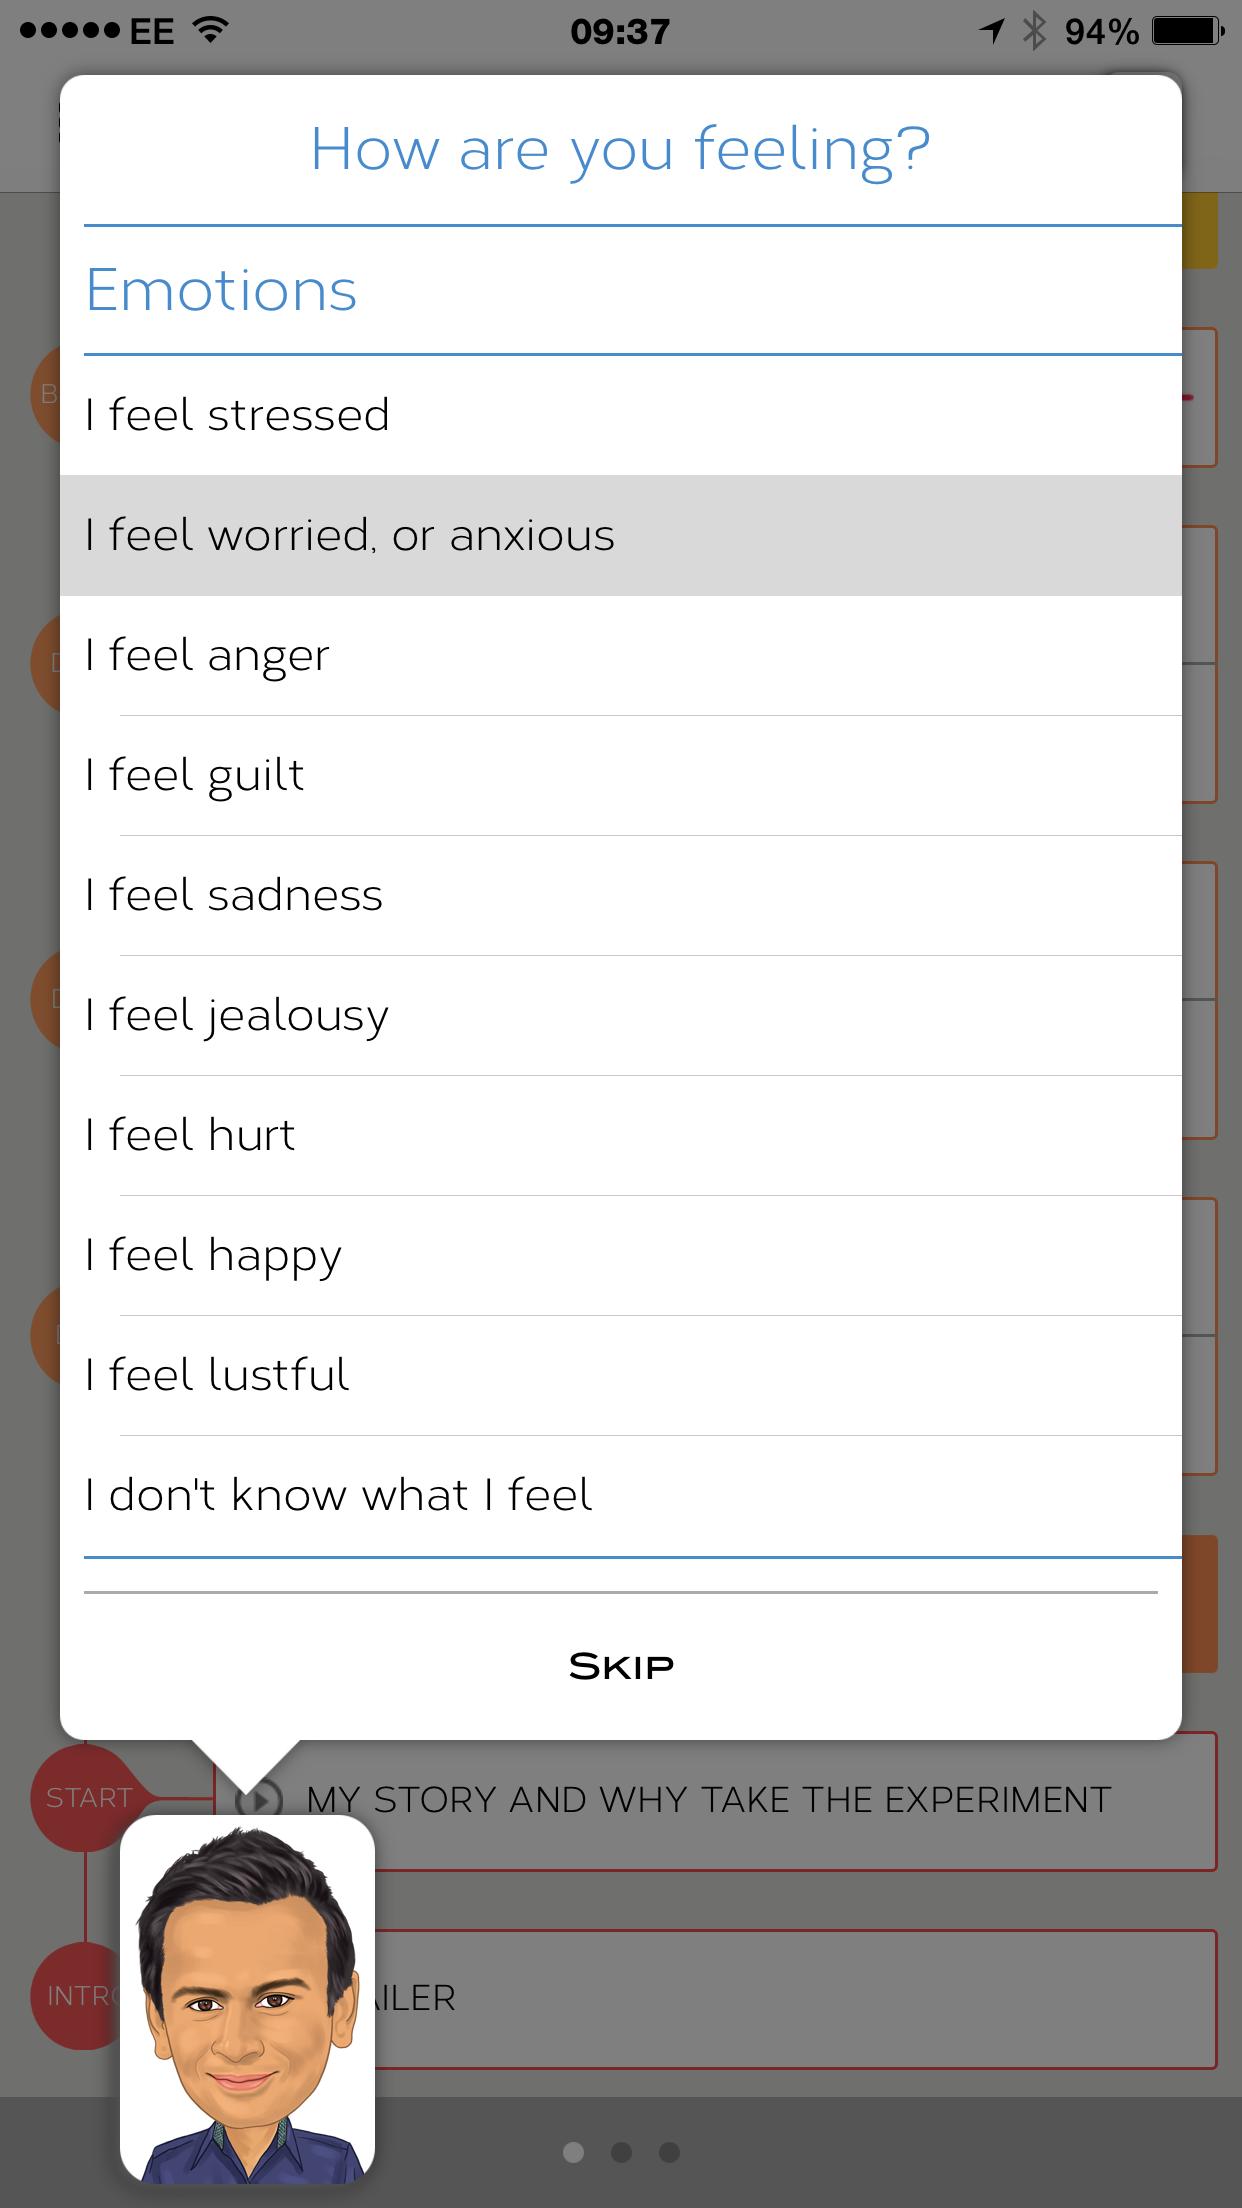 How are you feeling screenshot 1